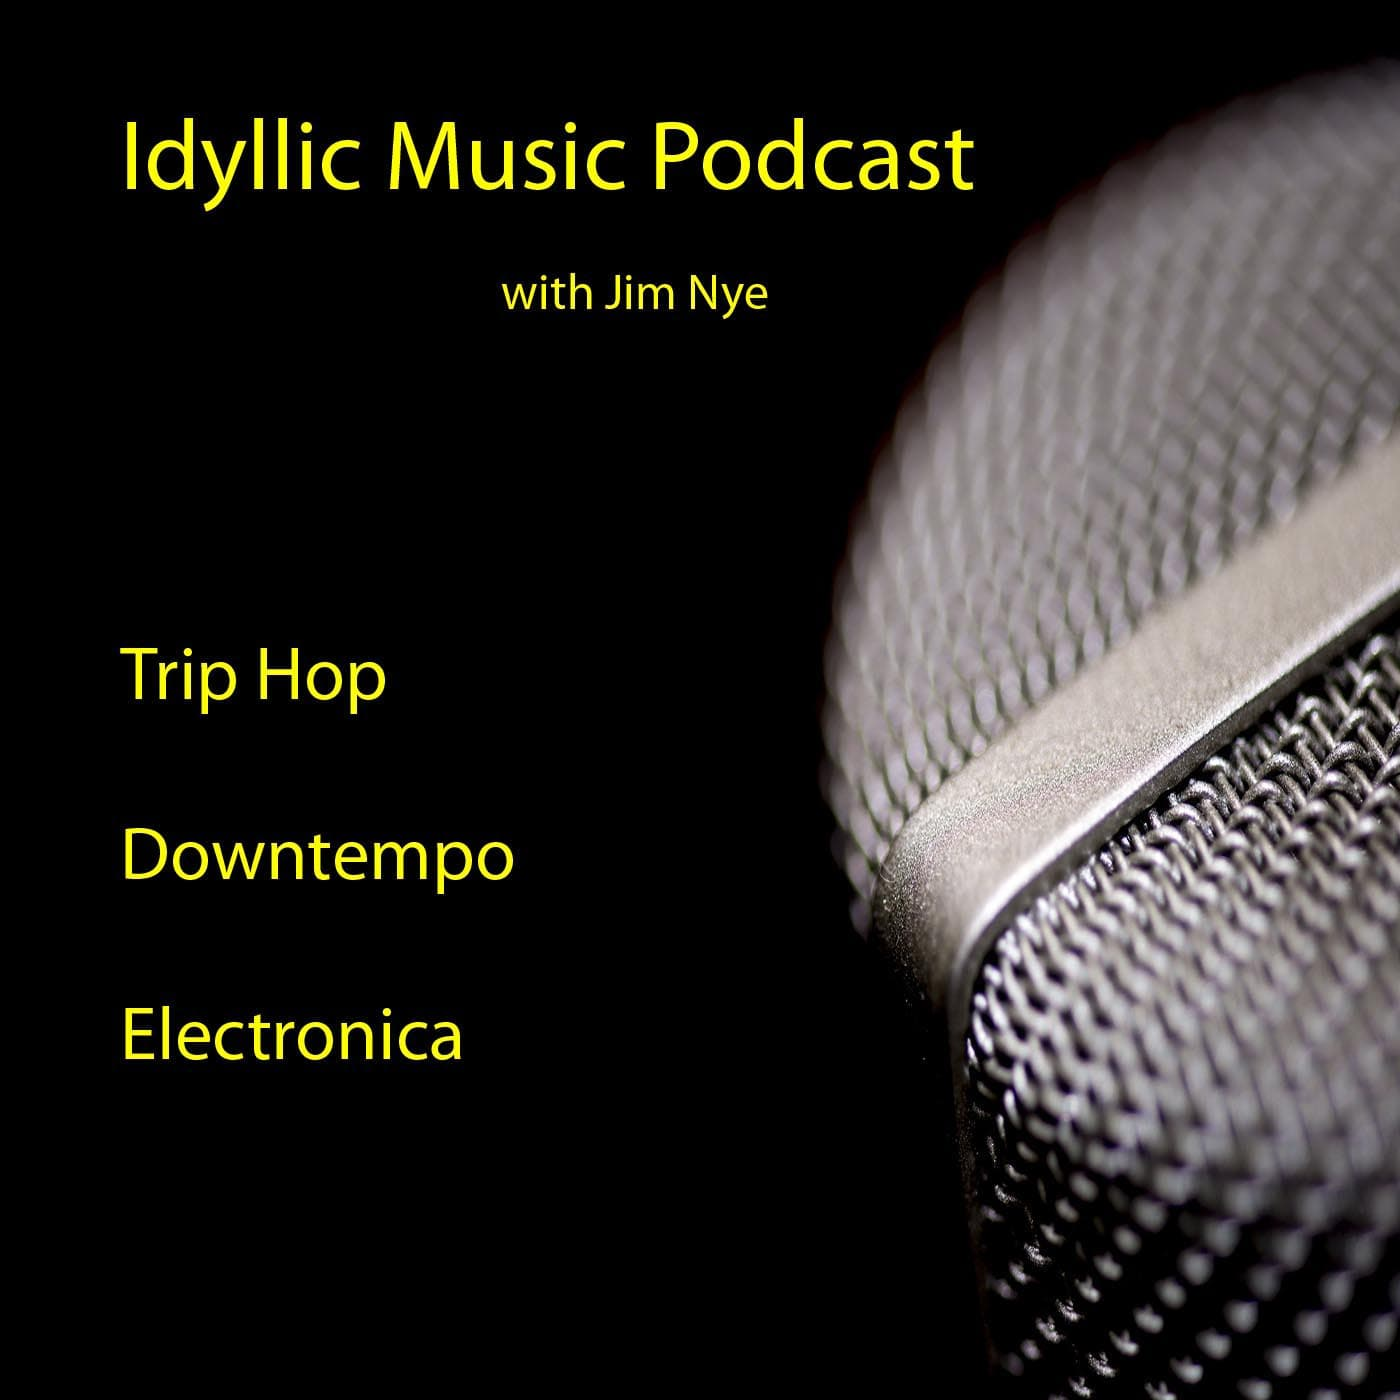 Idyllic Music Podcast | Trip Hop - Downtempo - Electronica show art